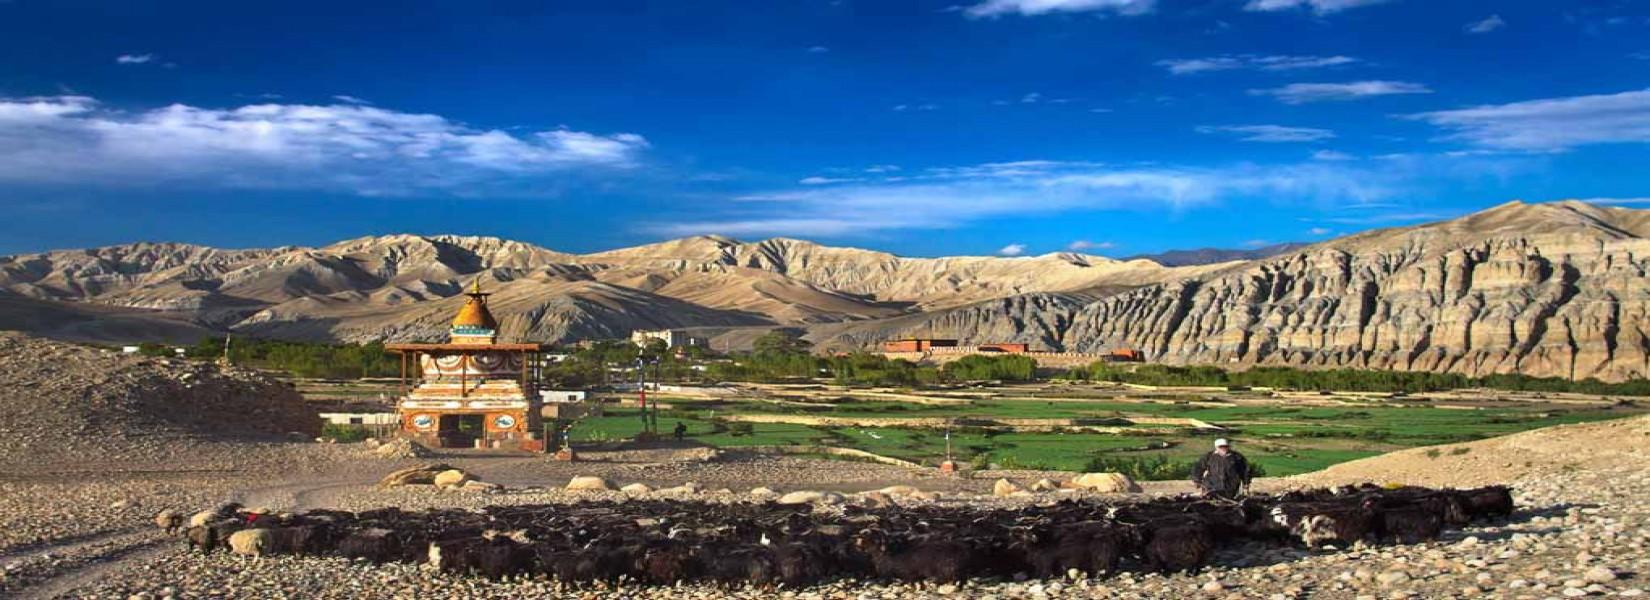 Upper Mustang Journey